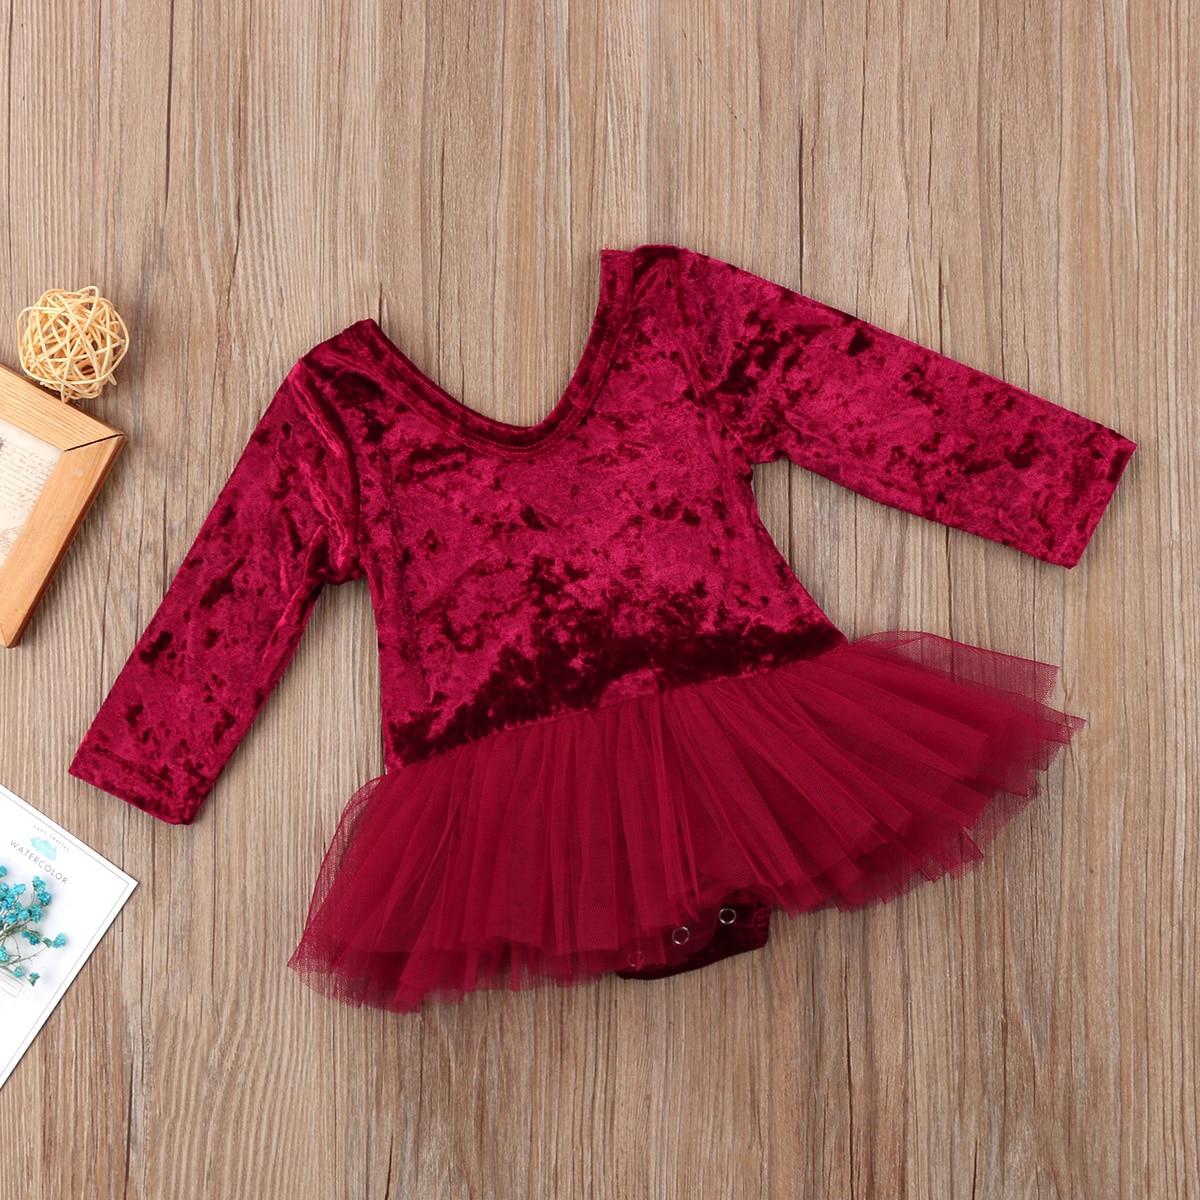 Newborn Kid Baby Girls Romper Tulle Pleuche Dress in Dresses from Mother Kids